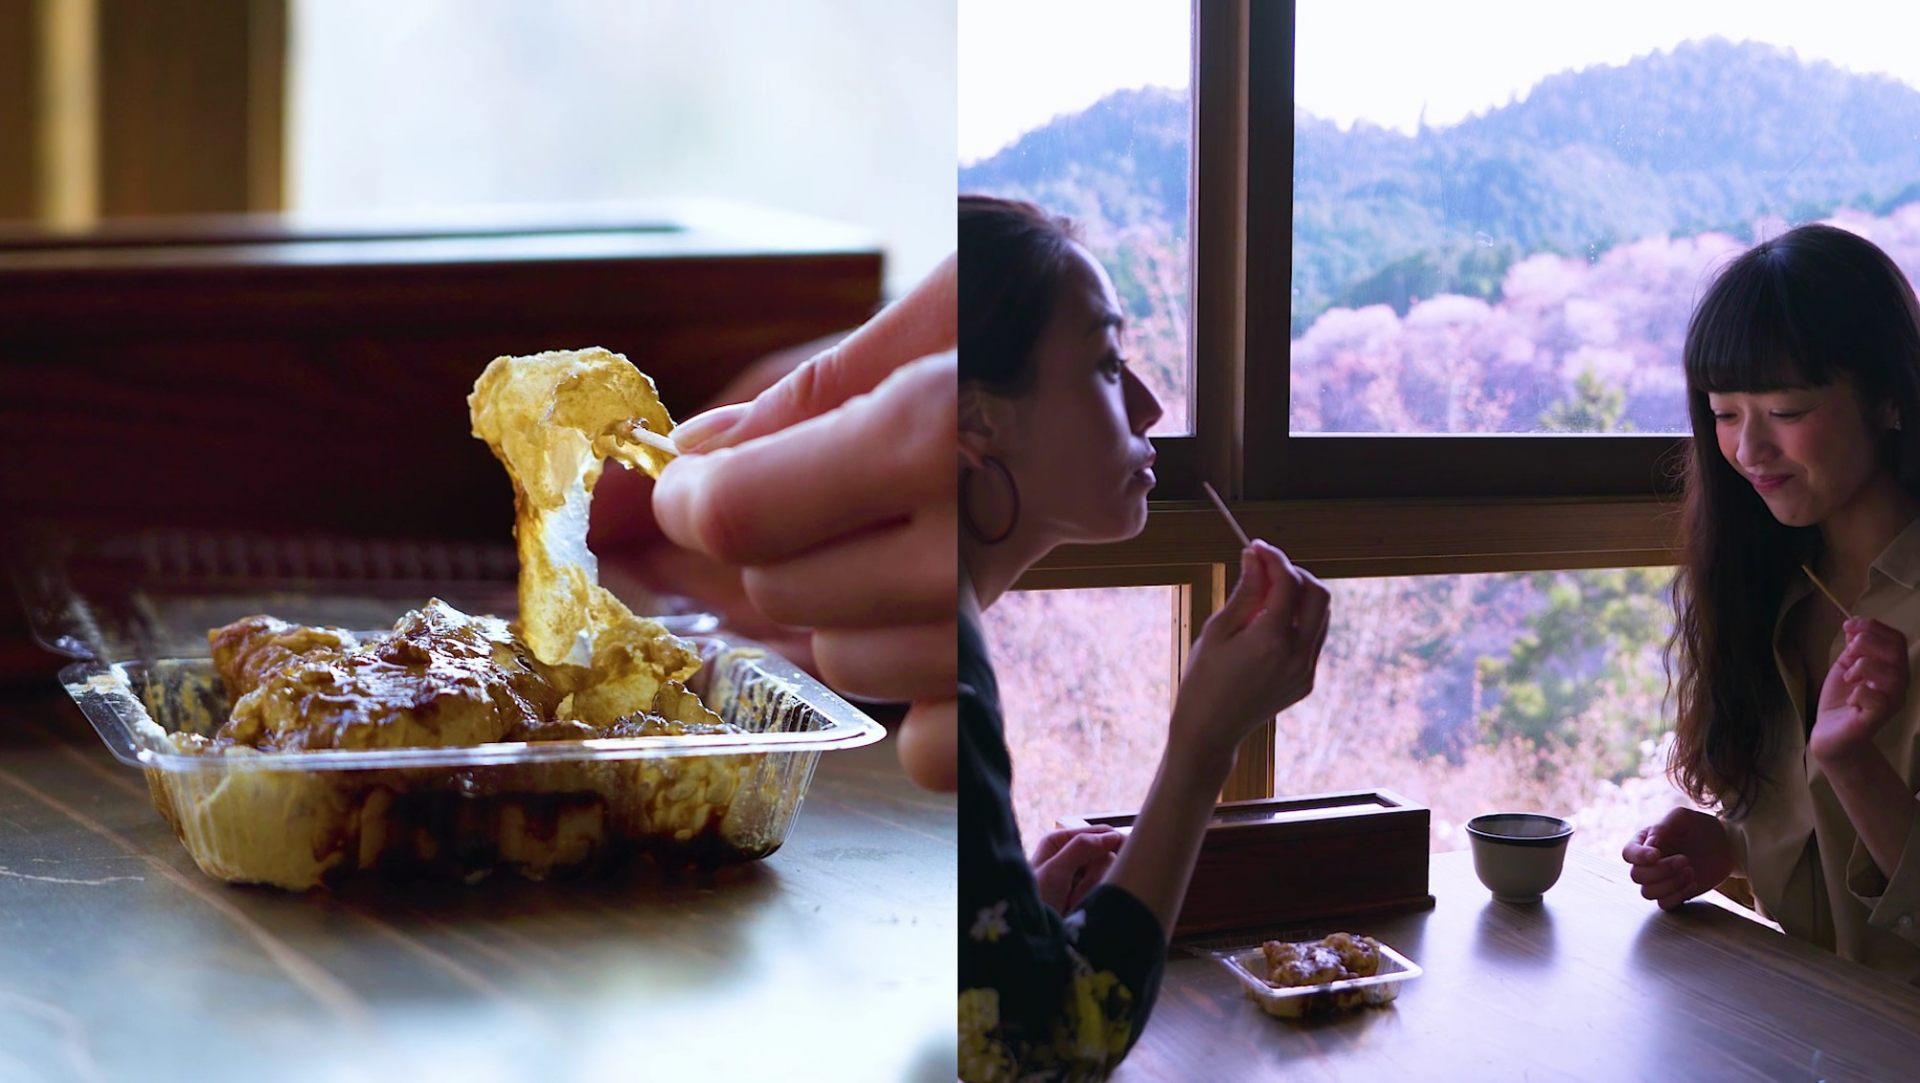 Kuzumochi is a Japanese confection made from Yoshino kudzu.